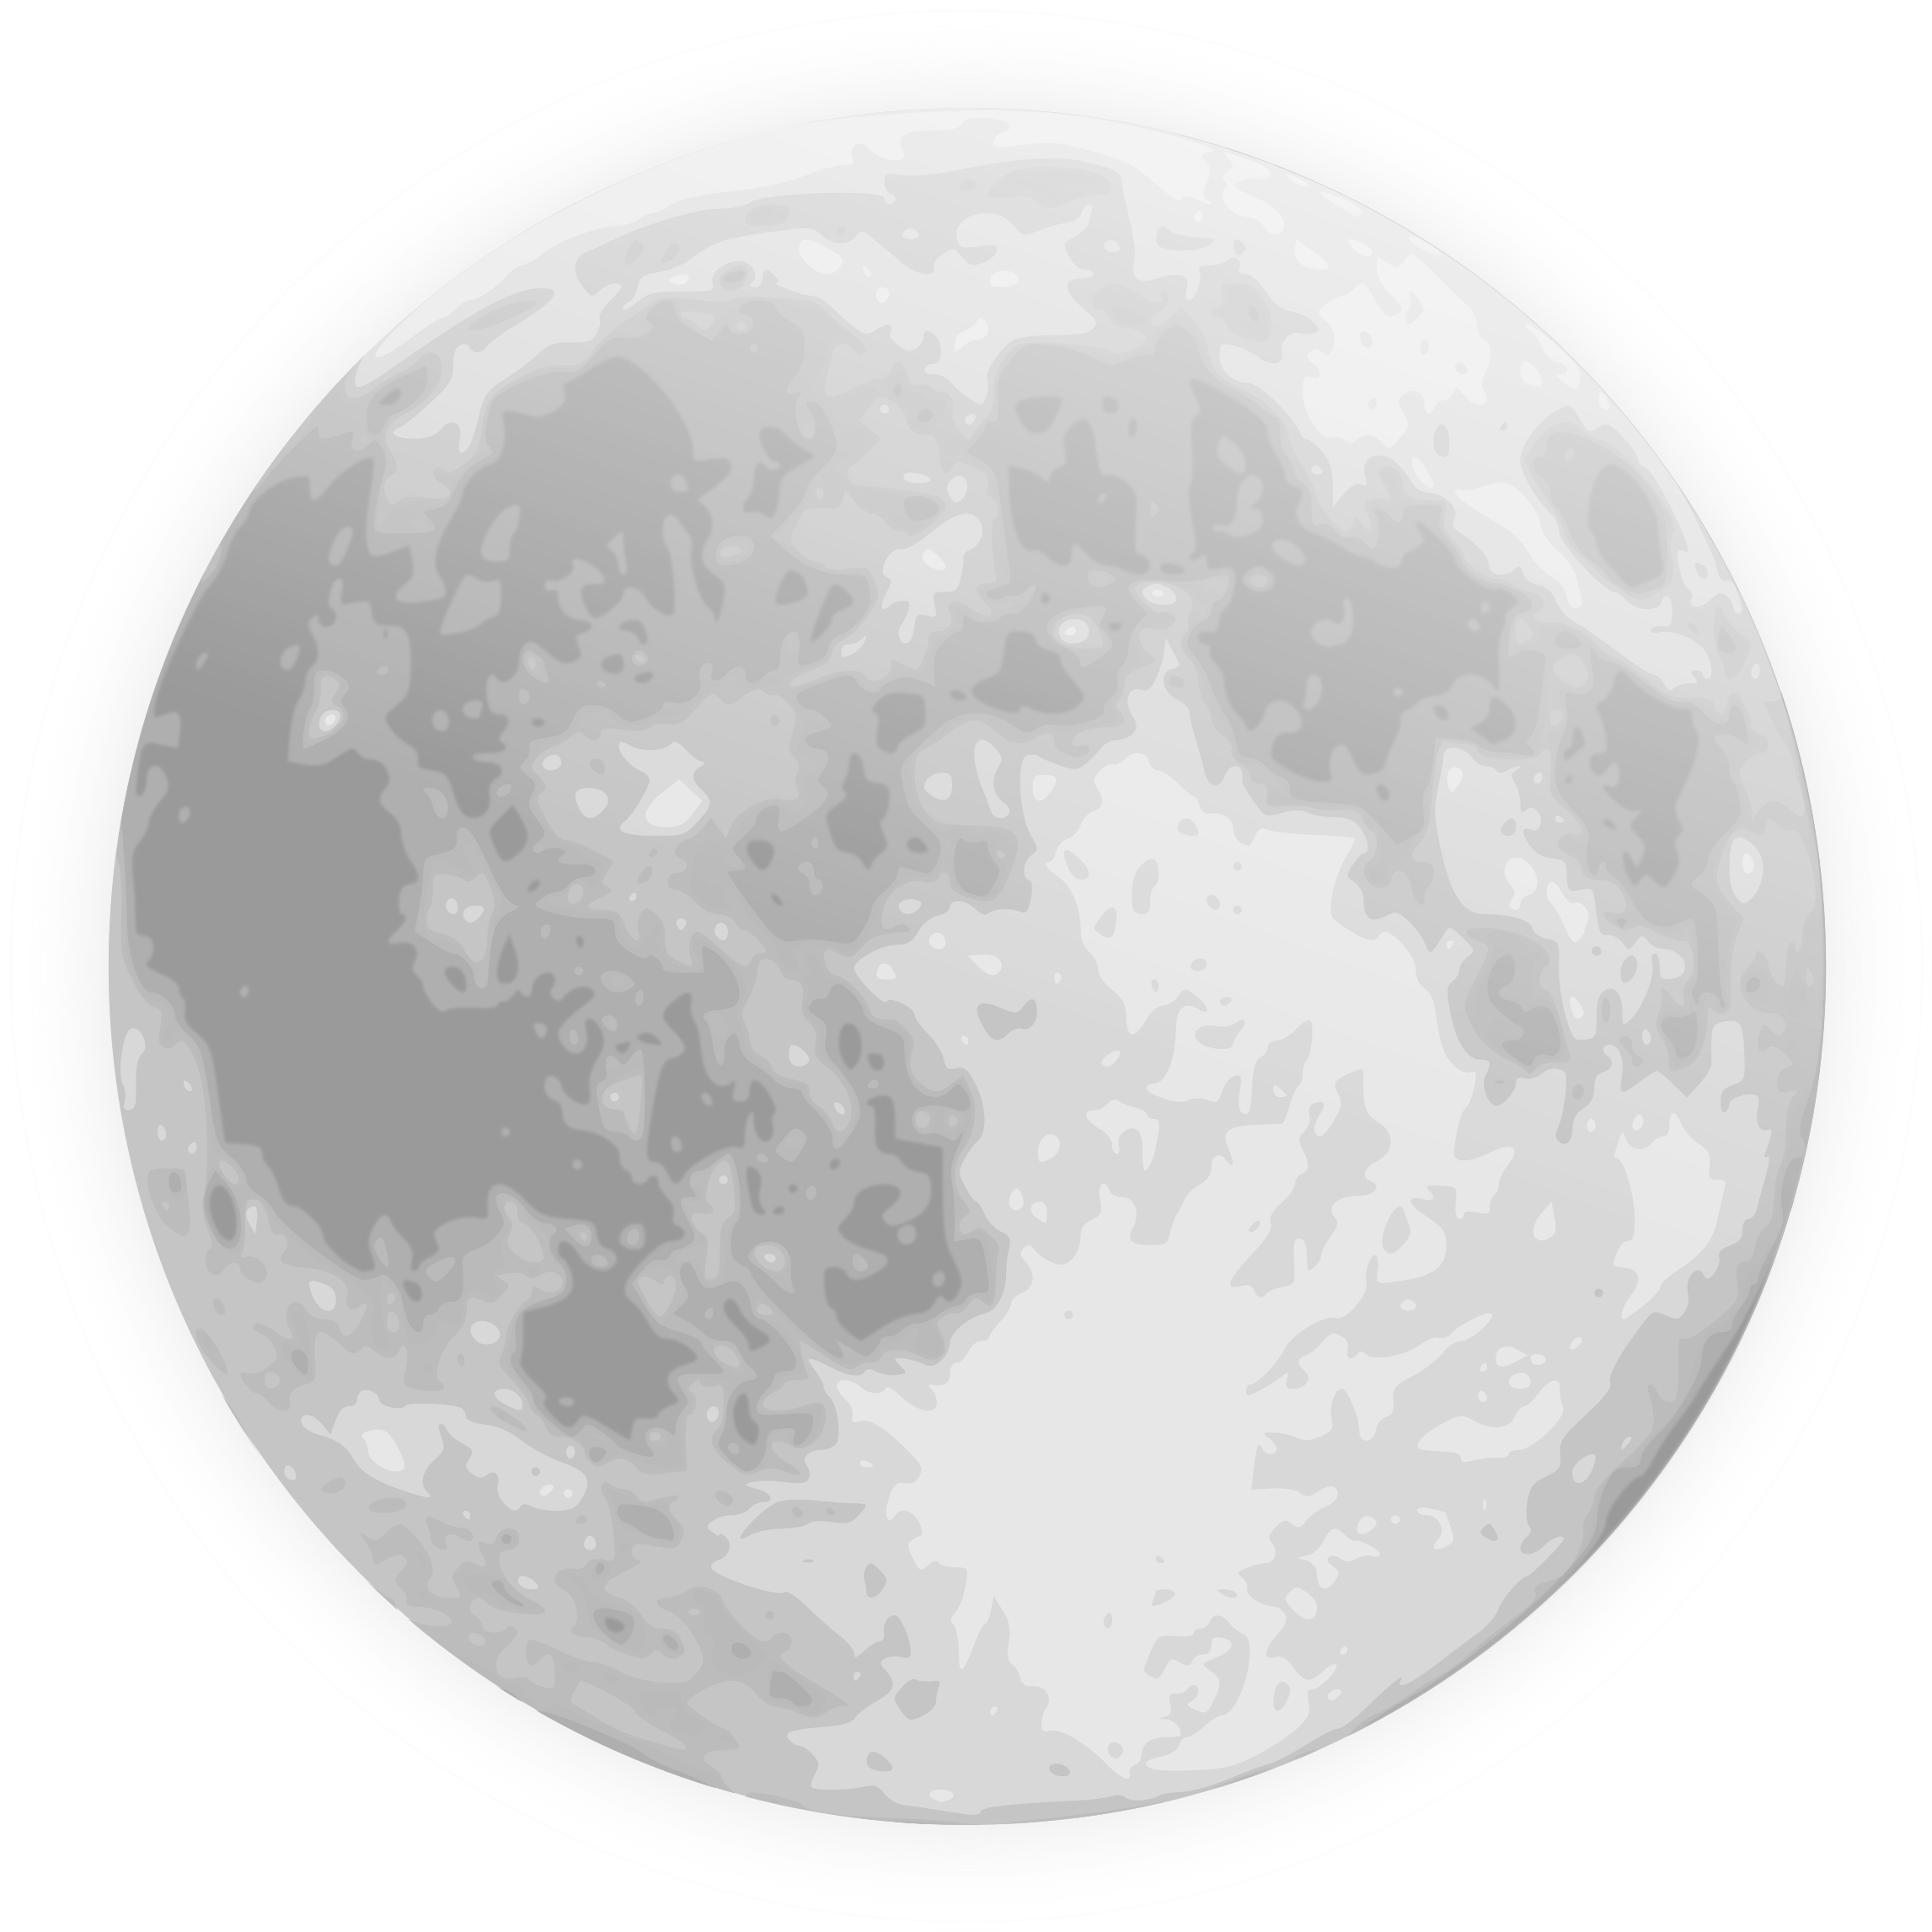 Download Jpg Transparent Images Free Download - Moon Png ...